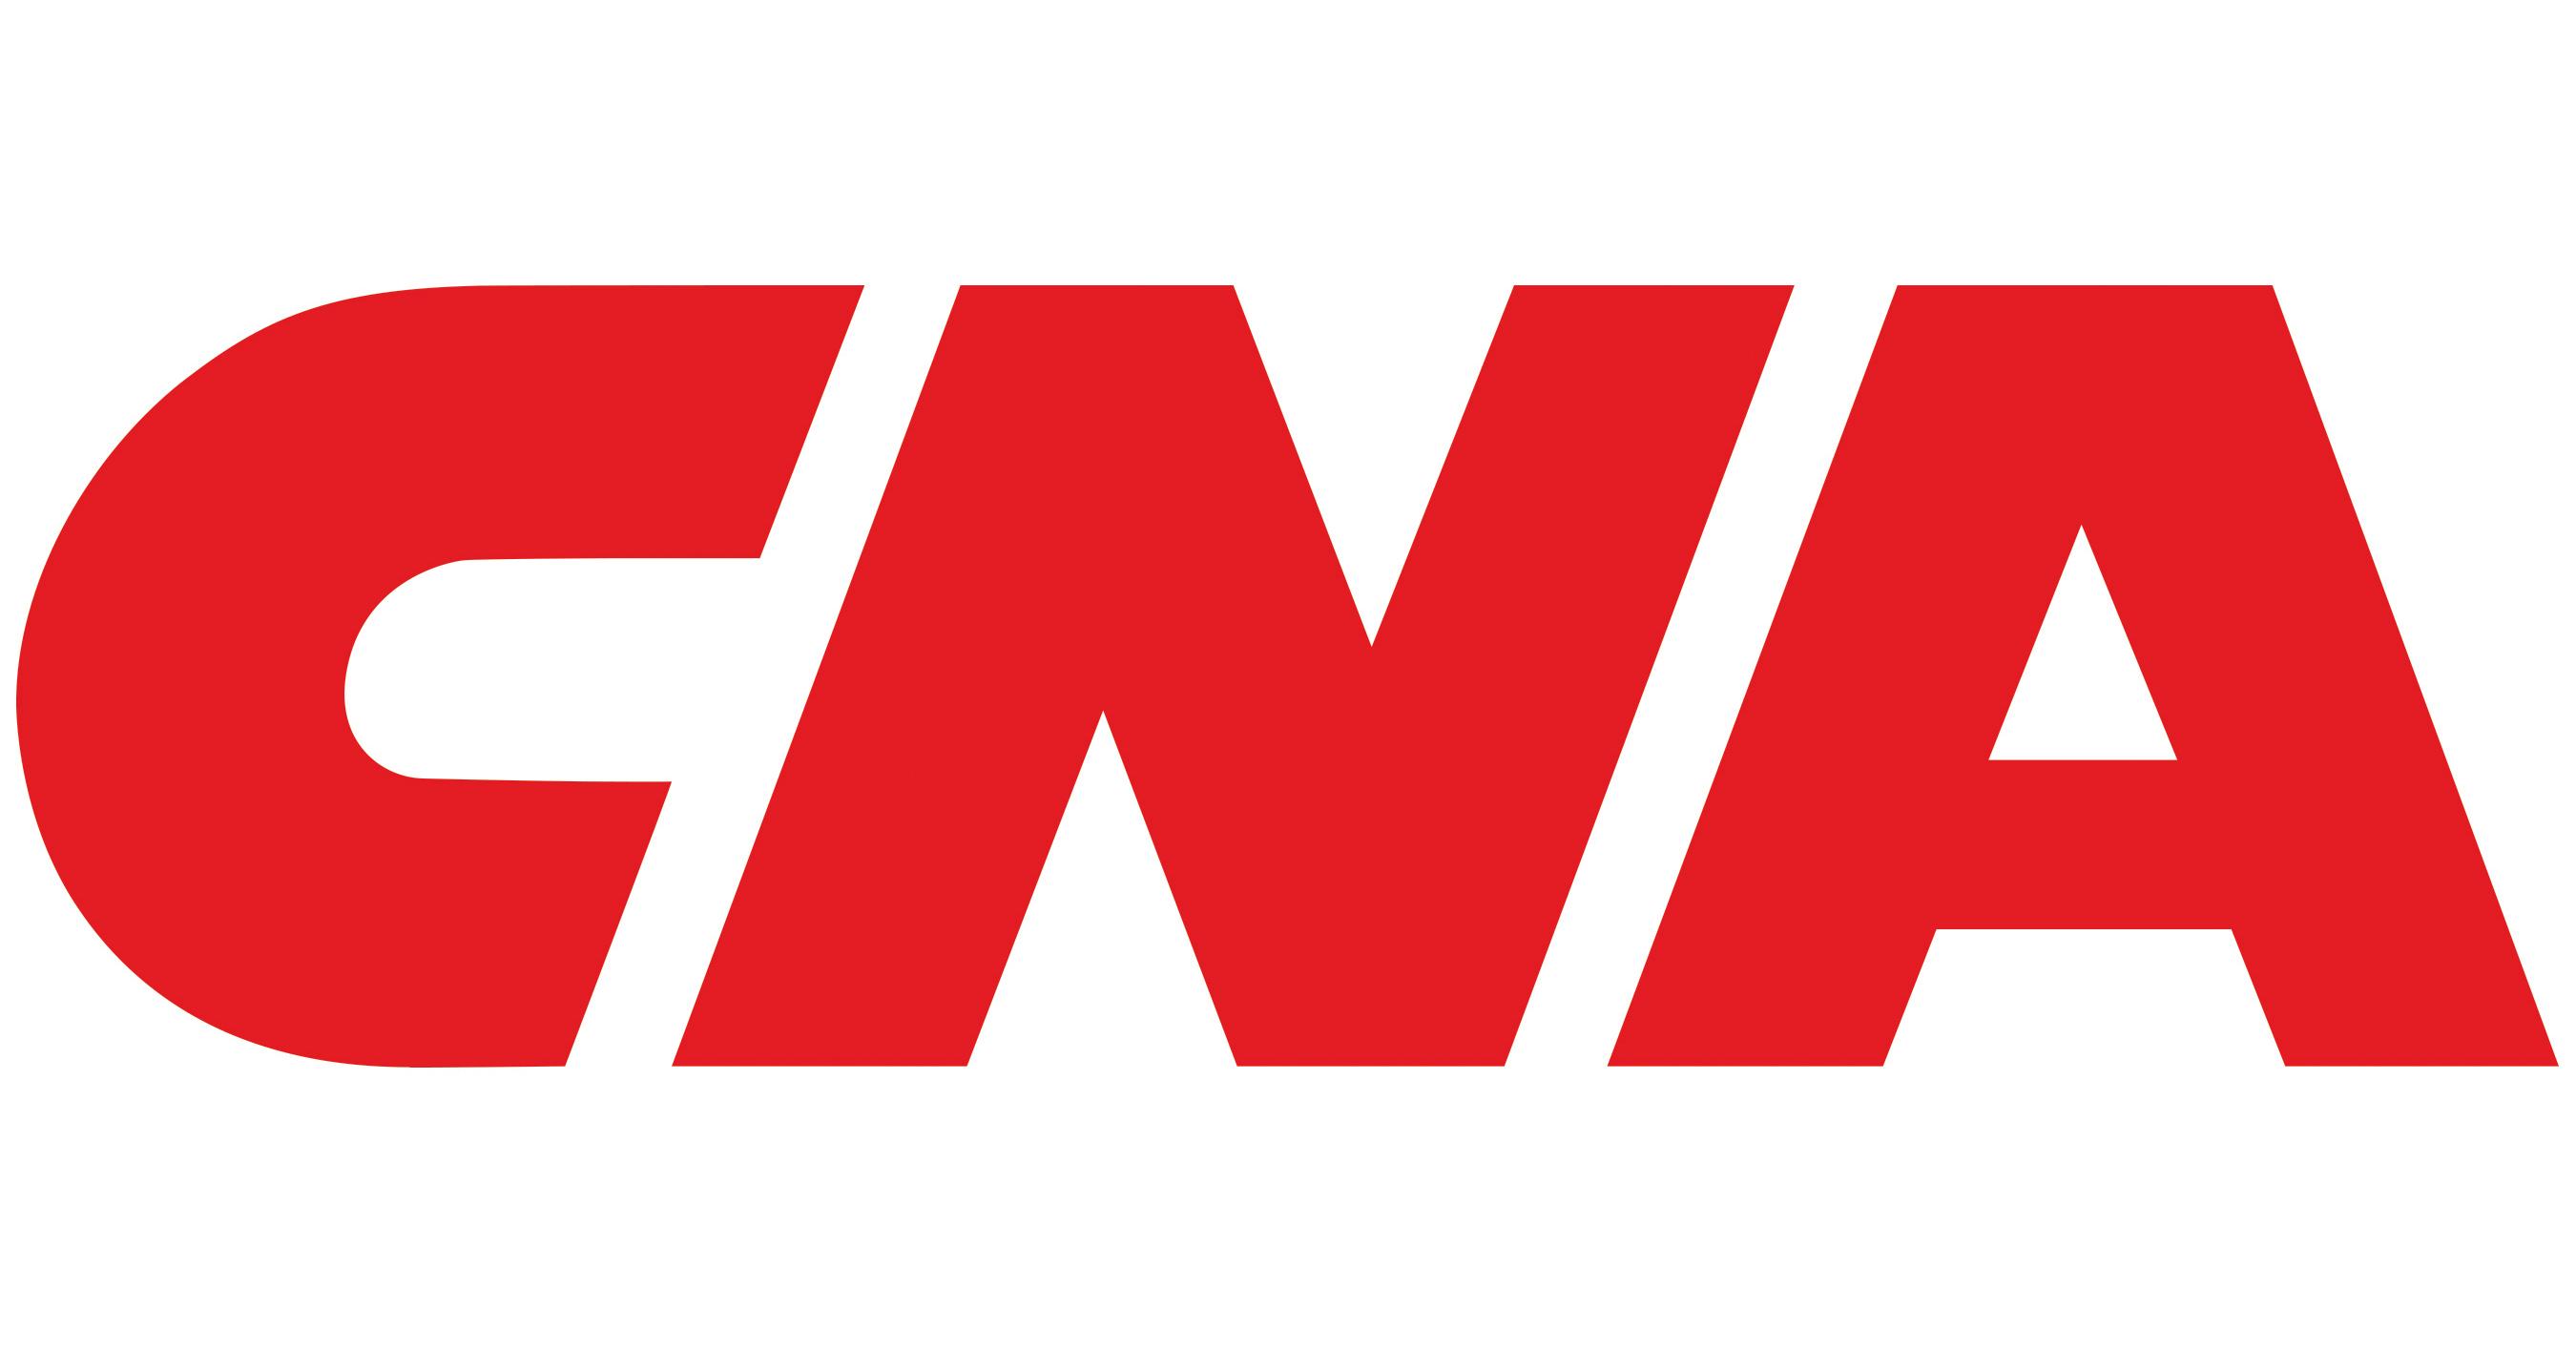 CNA Financial logo